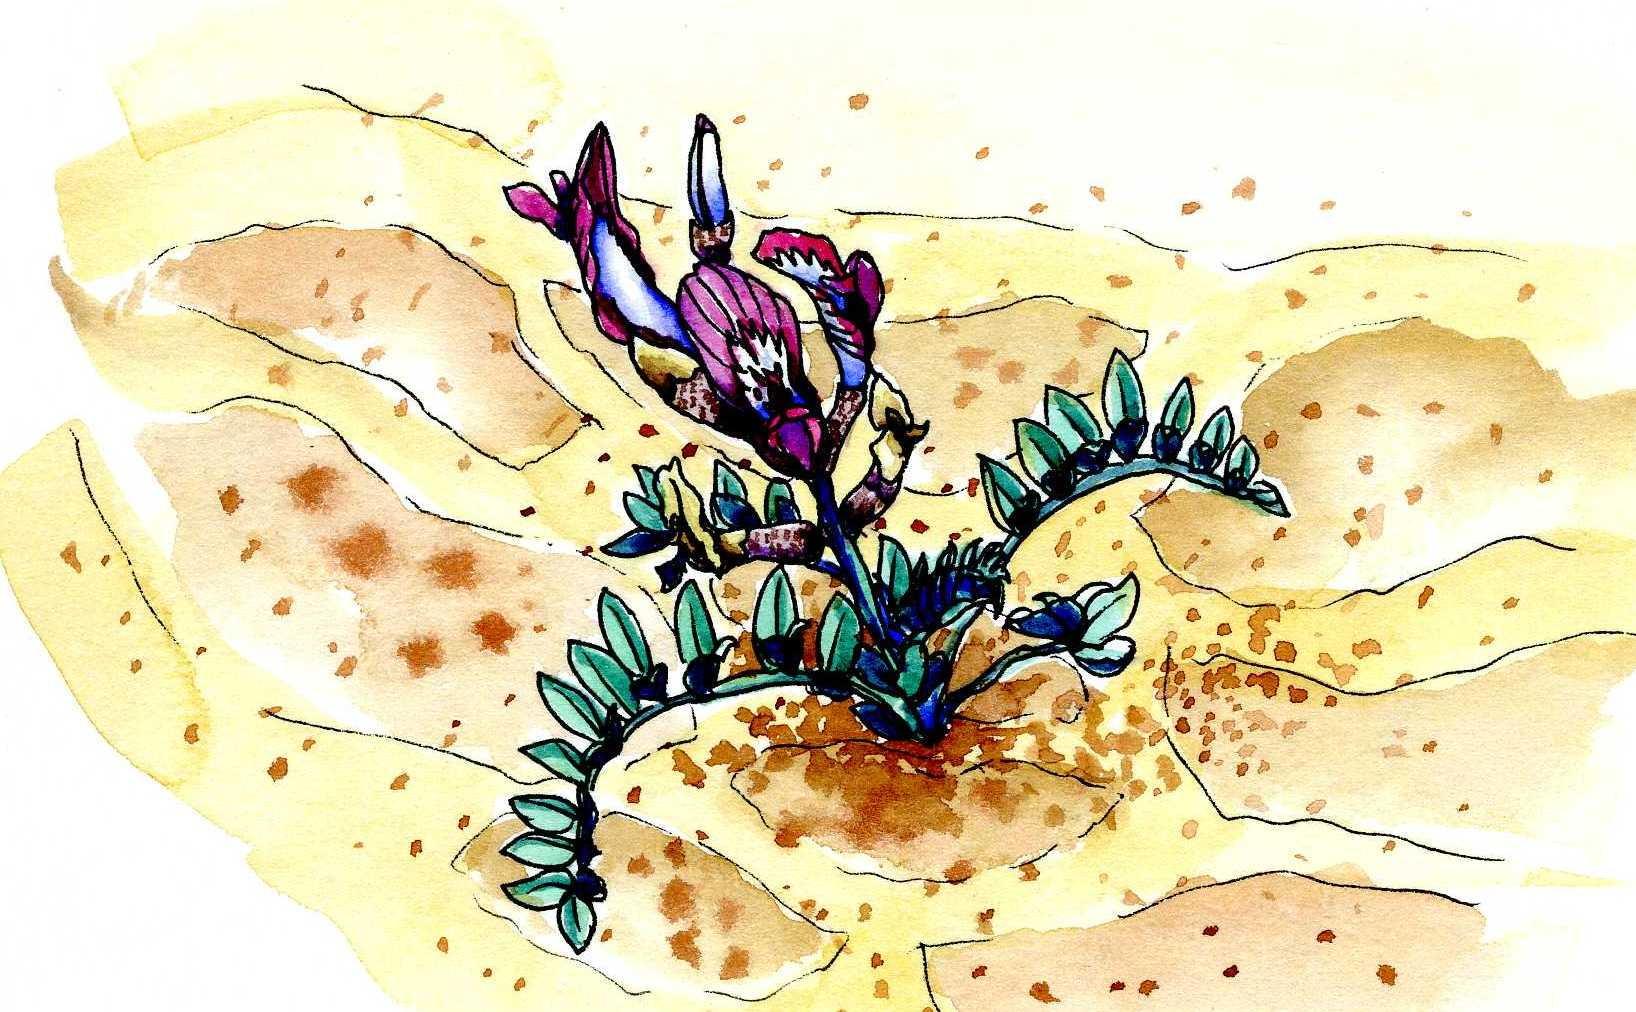 Astragalus sp., Canyonlands National Park